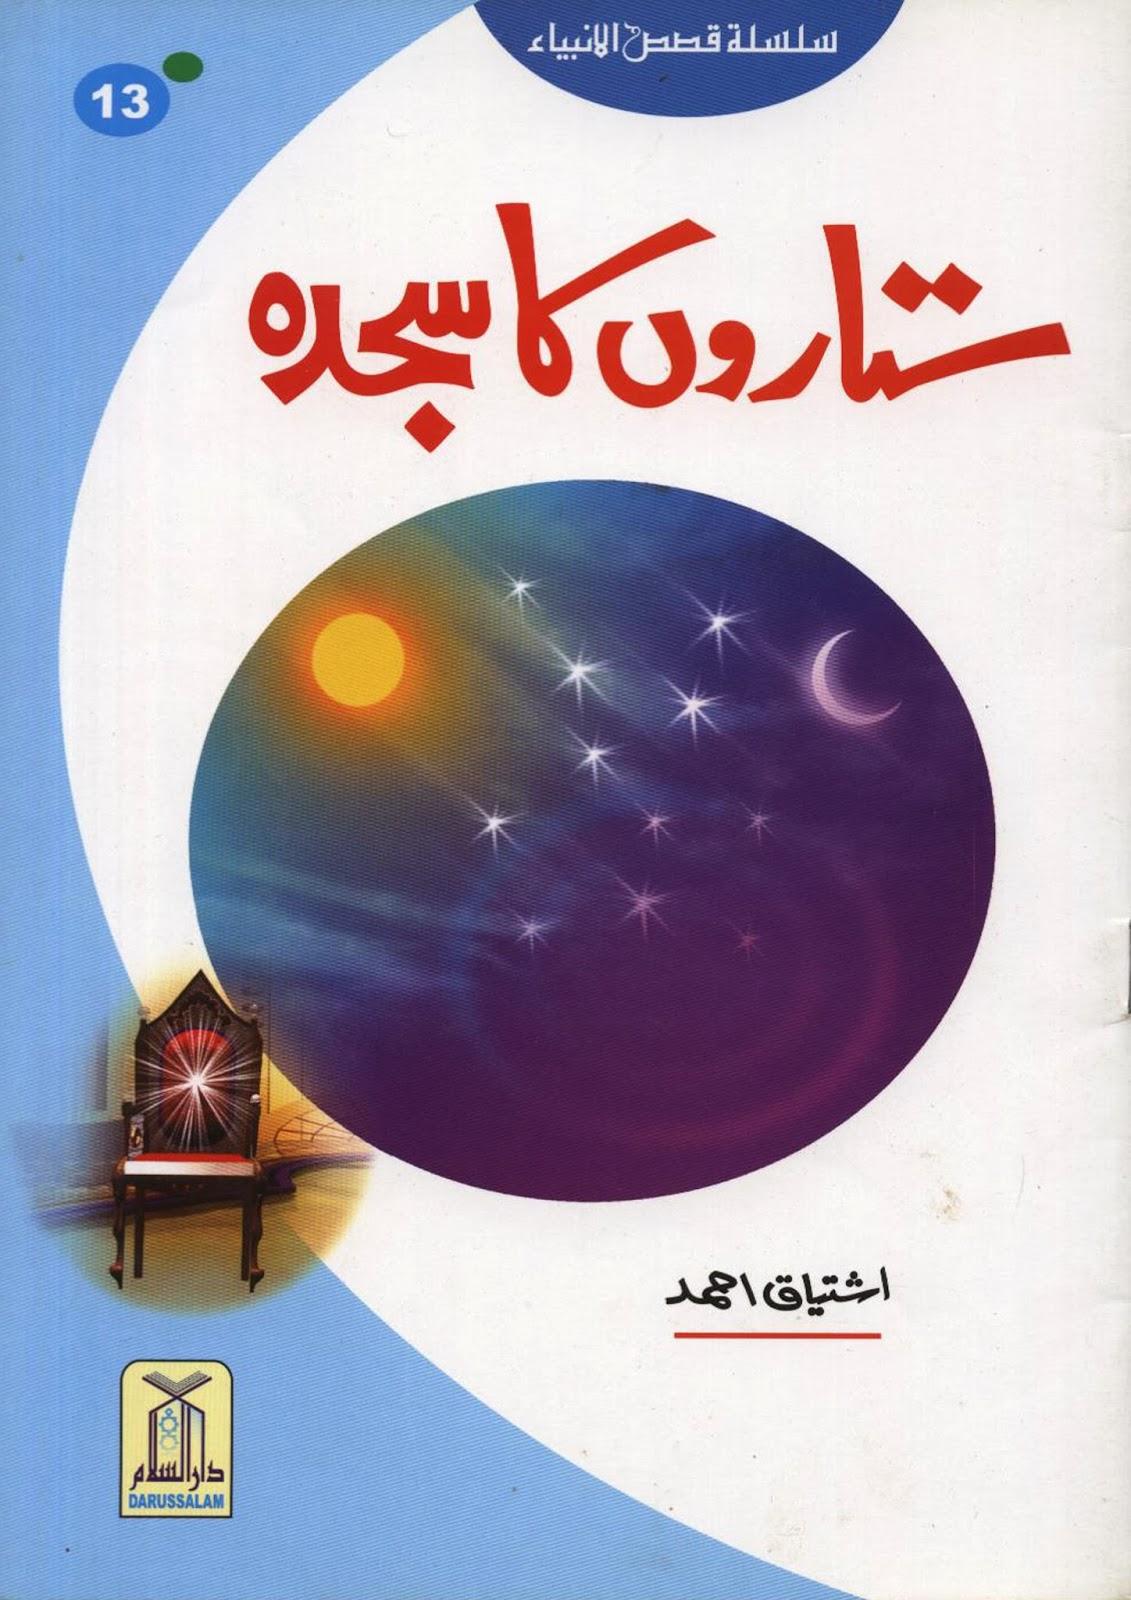 http://urduguru1.blogspot.com/2014/03/sitaron-ka-sajda-prophet-yousaf-as.html